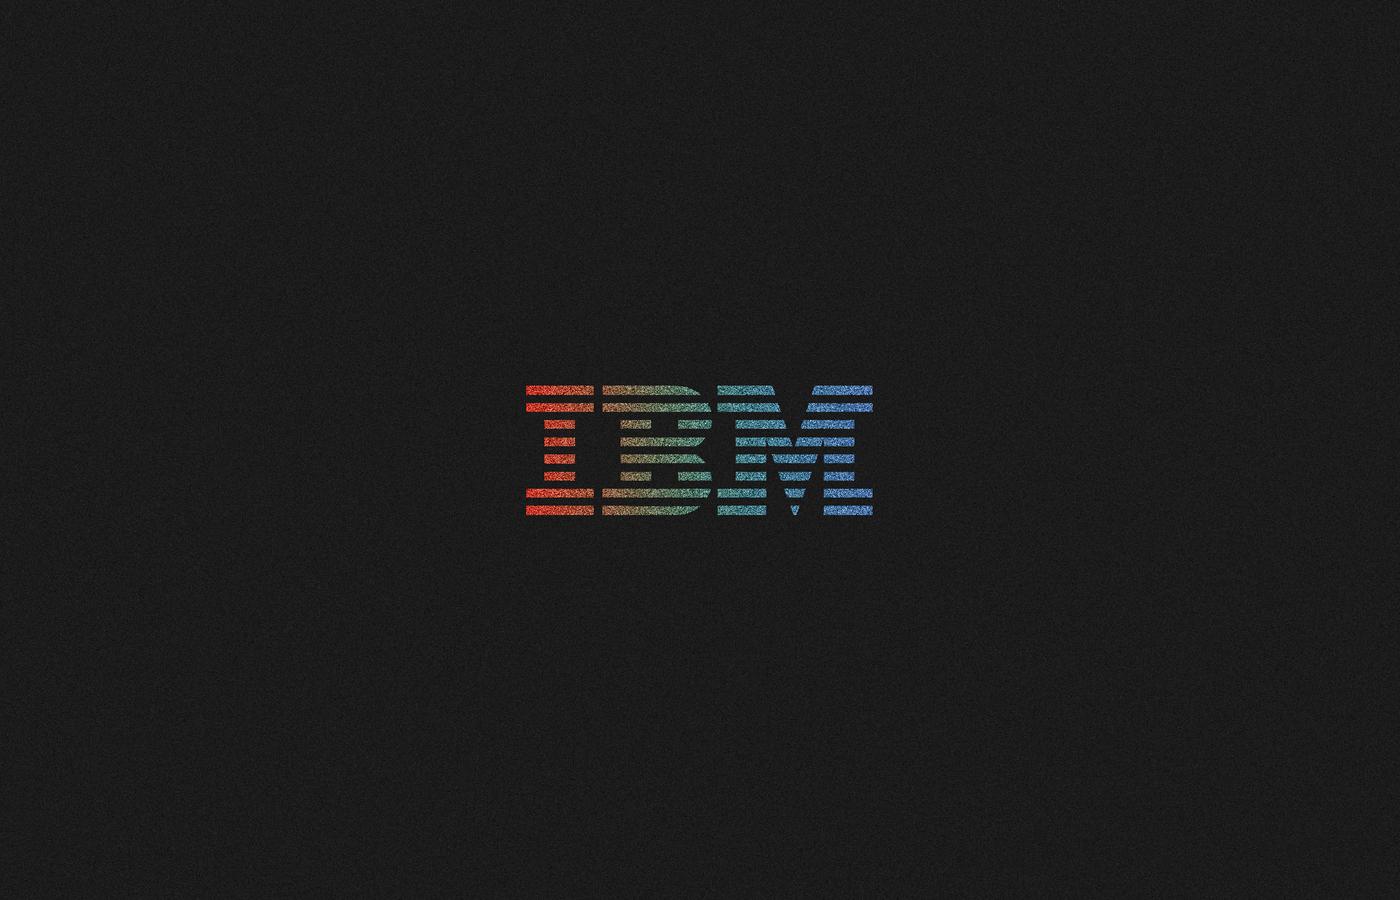 ibm-logo-6k.jpg